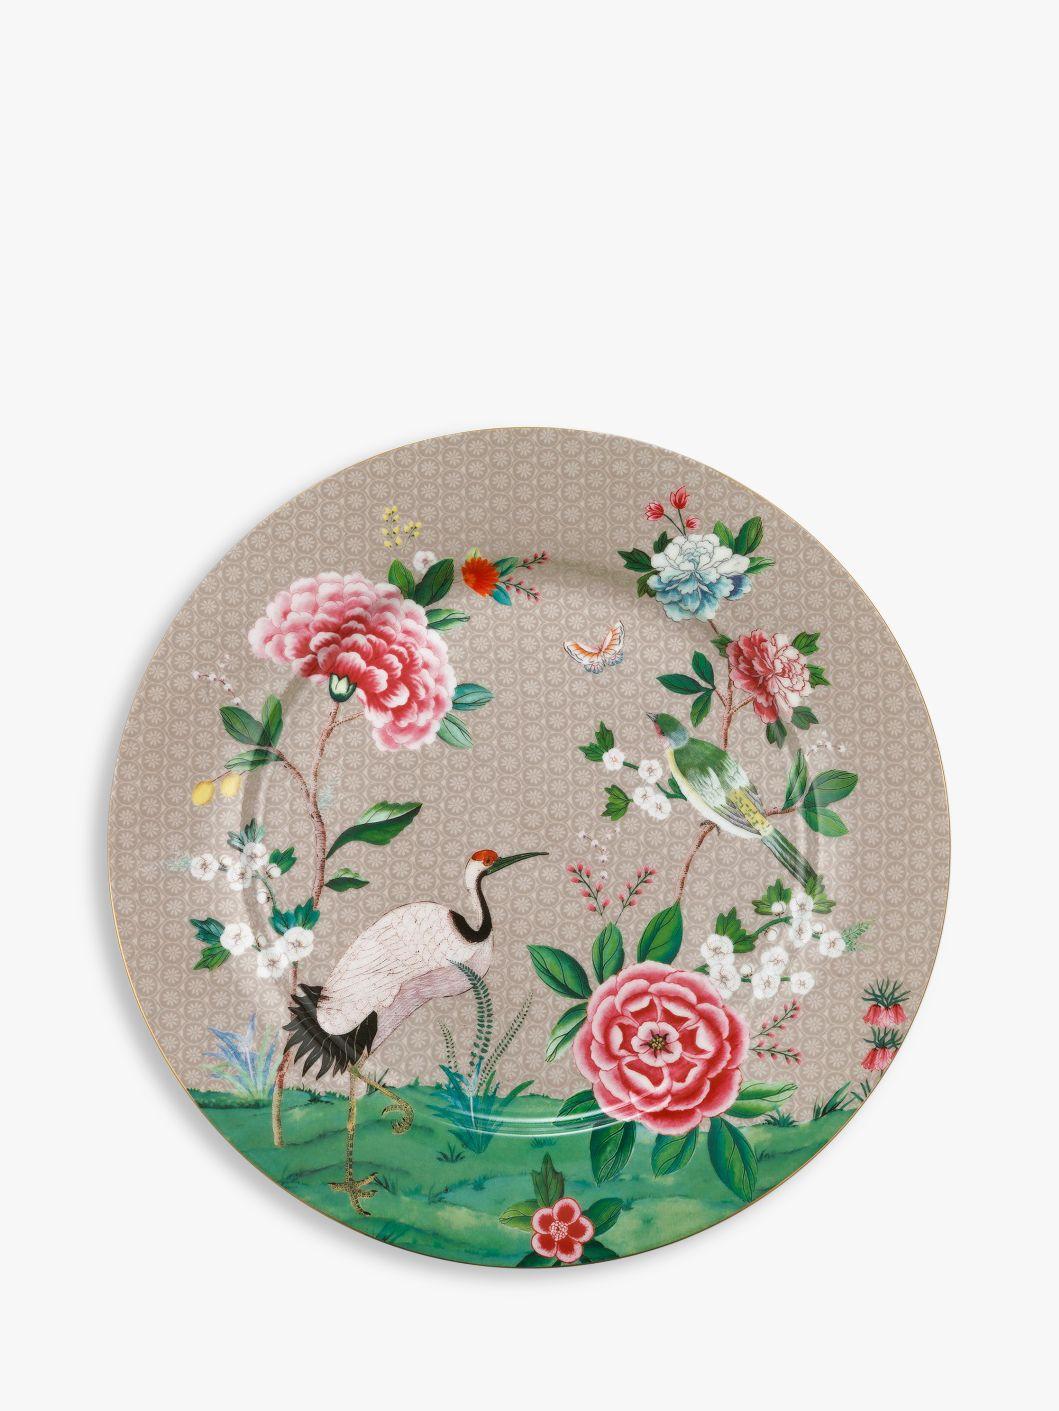 PiP Studio PiP Studio Blushing Birds Charger Plate, 32cm, Khaki/Multi